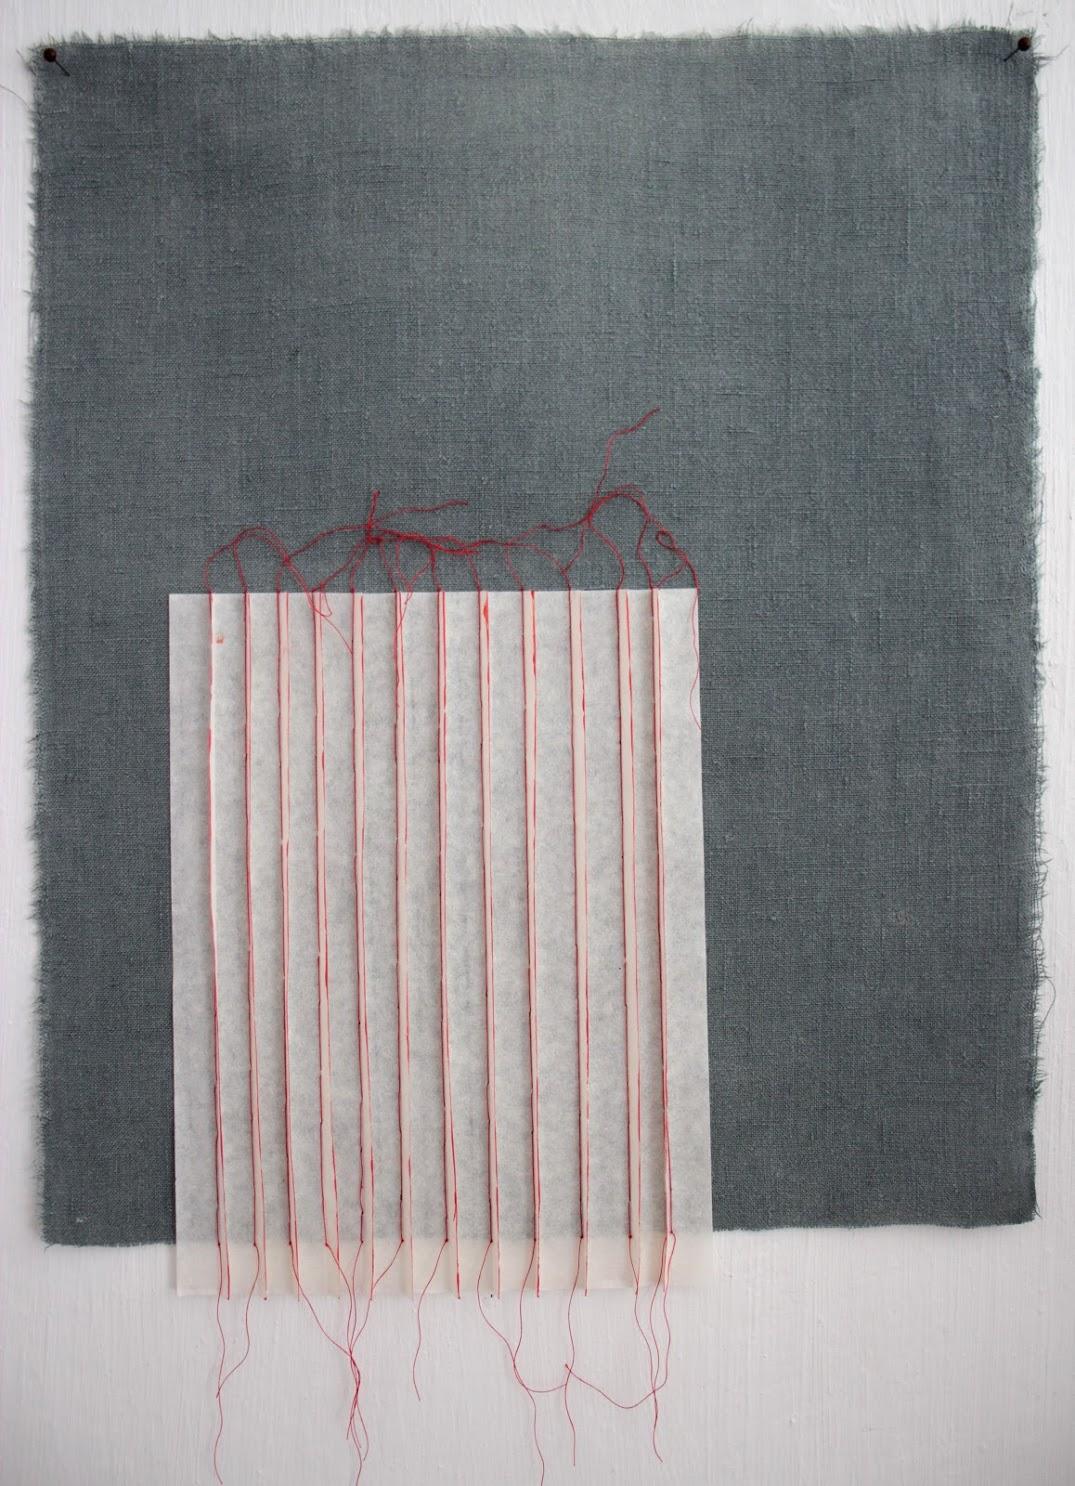 Christine Maringer: Rote Linie #5